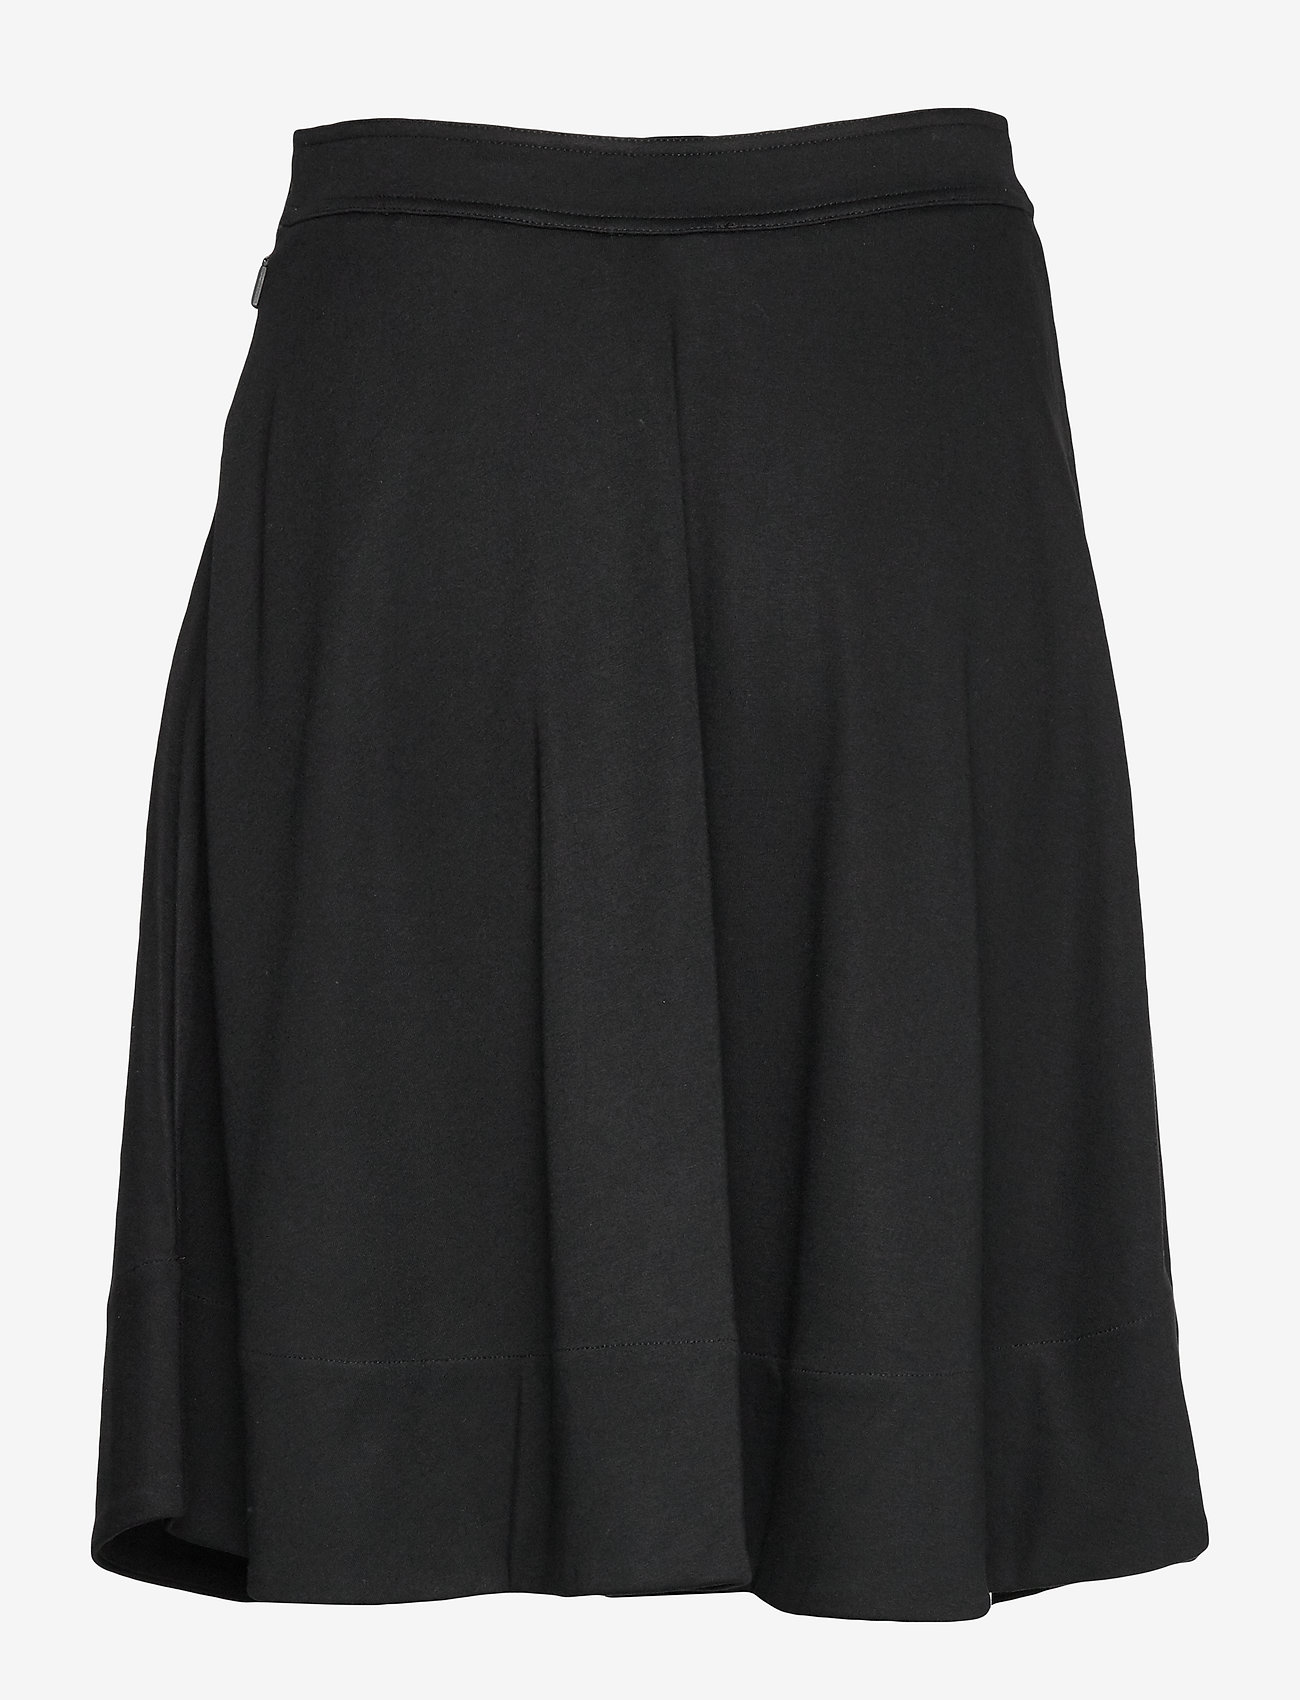 Calvin Klein Jersey Half Circle Skirt - Skirts